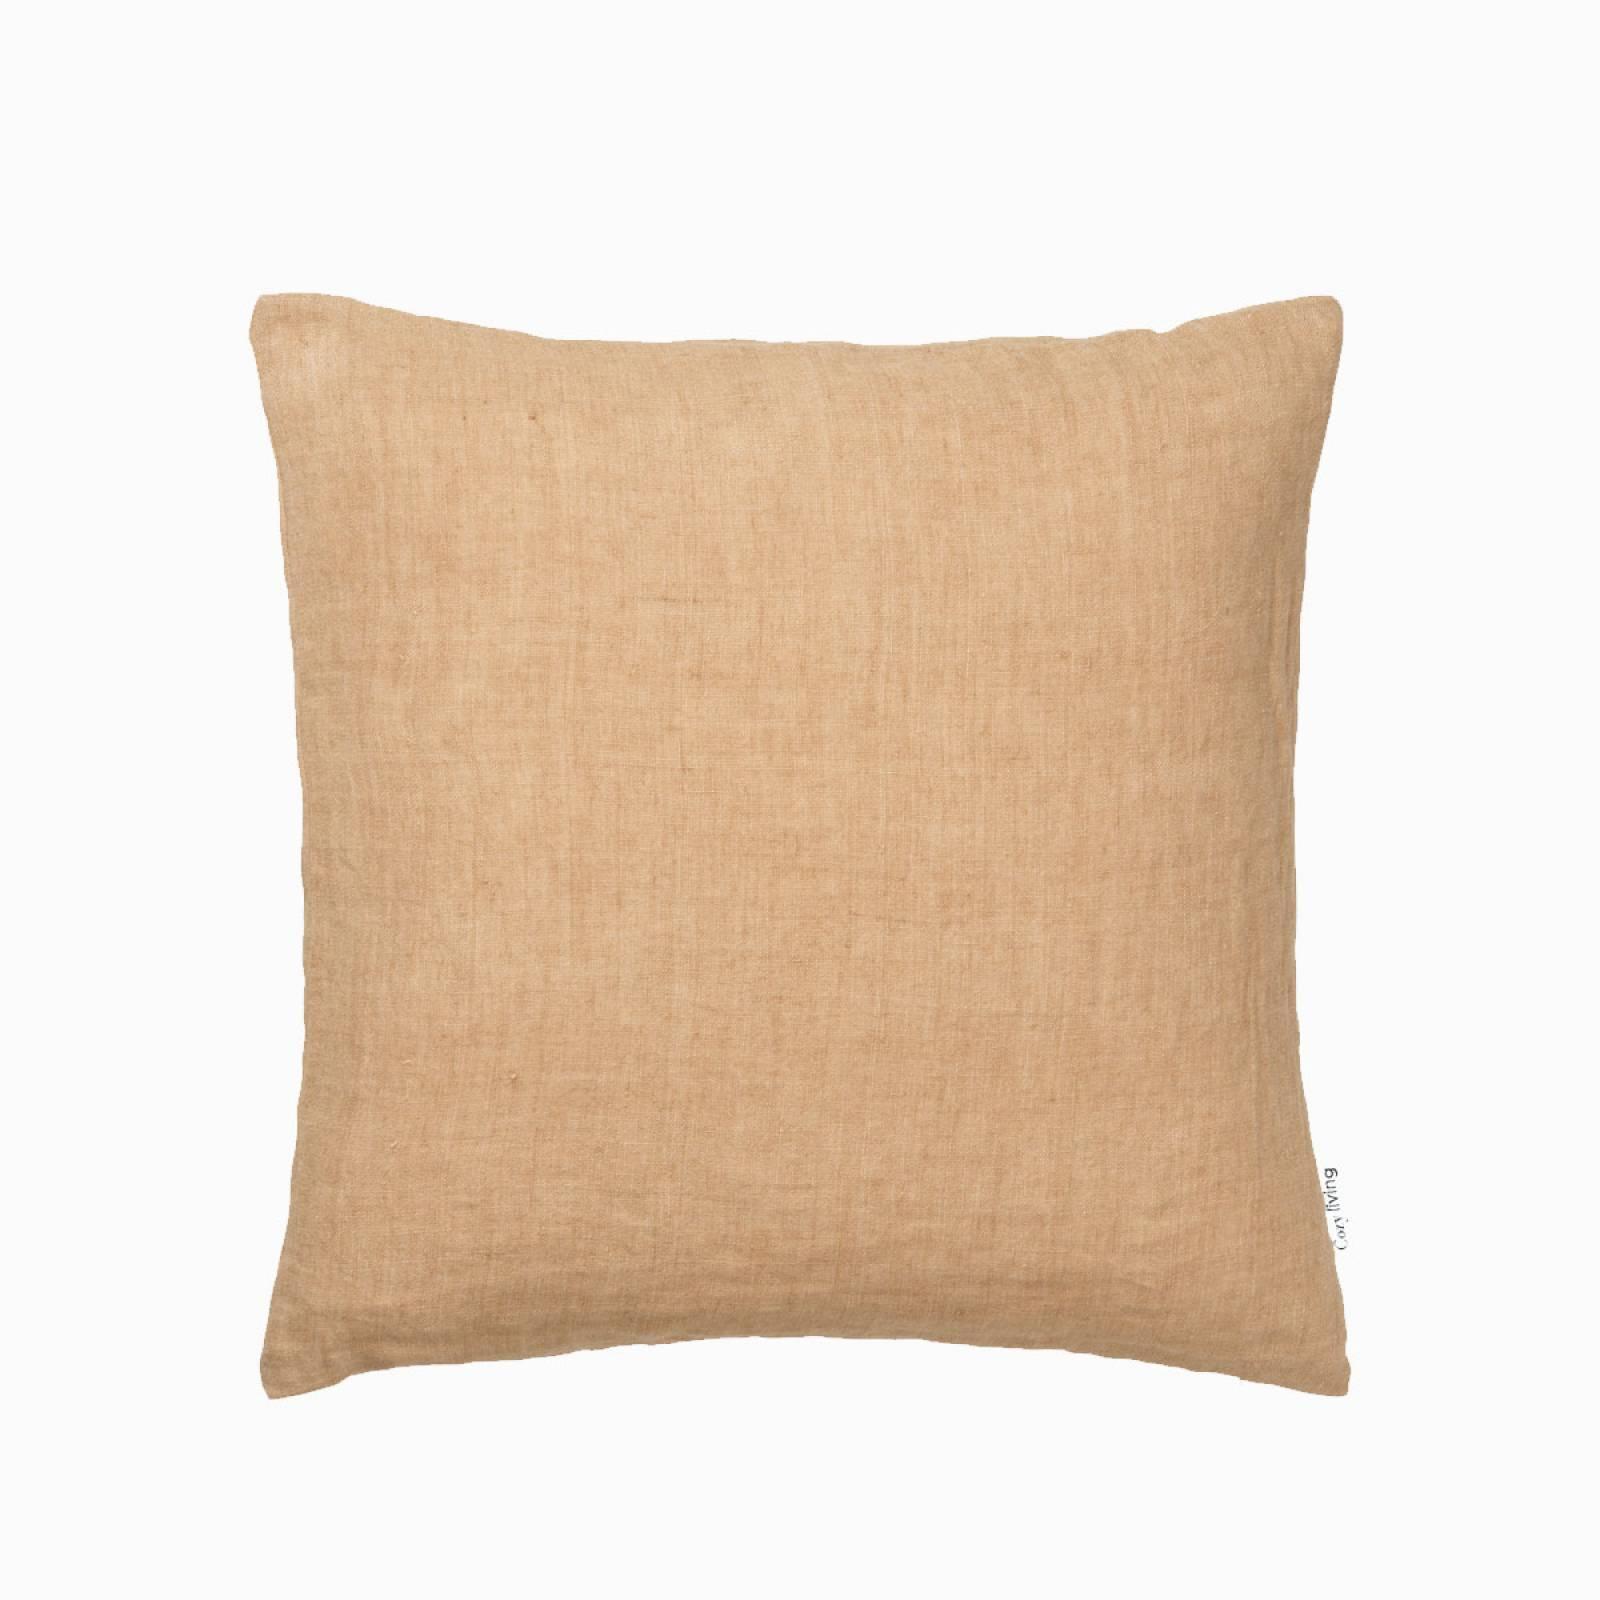 Square Linen Cushion In Caramel